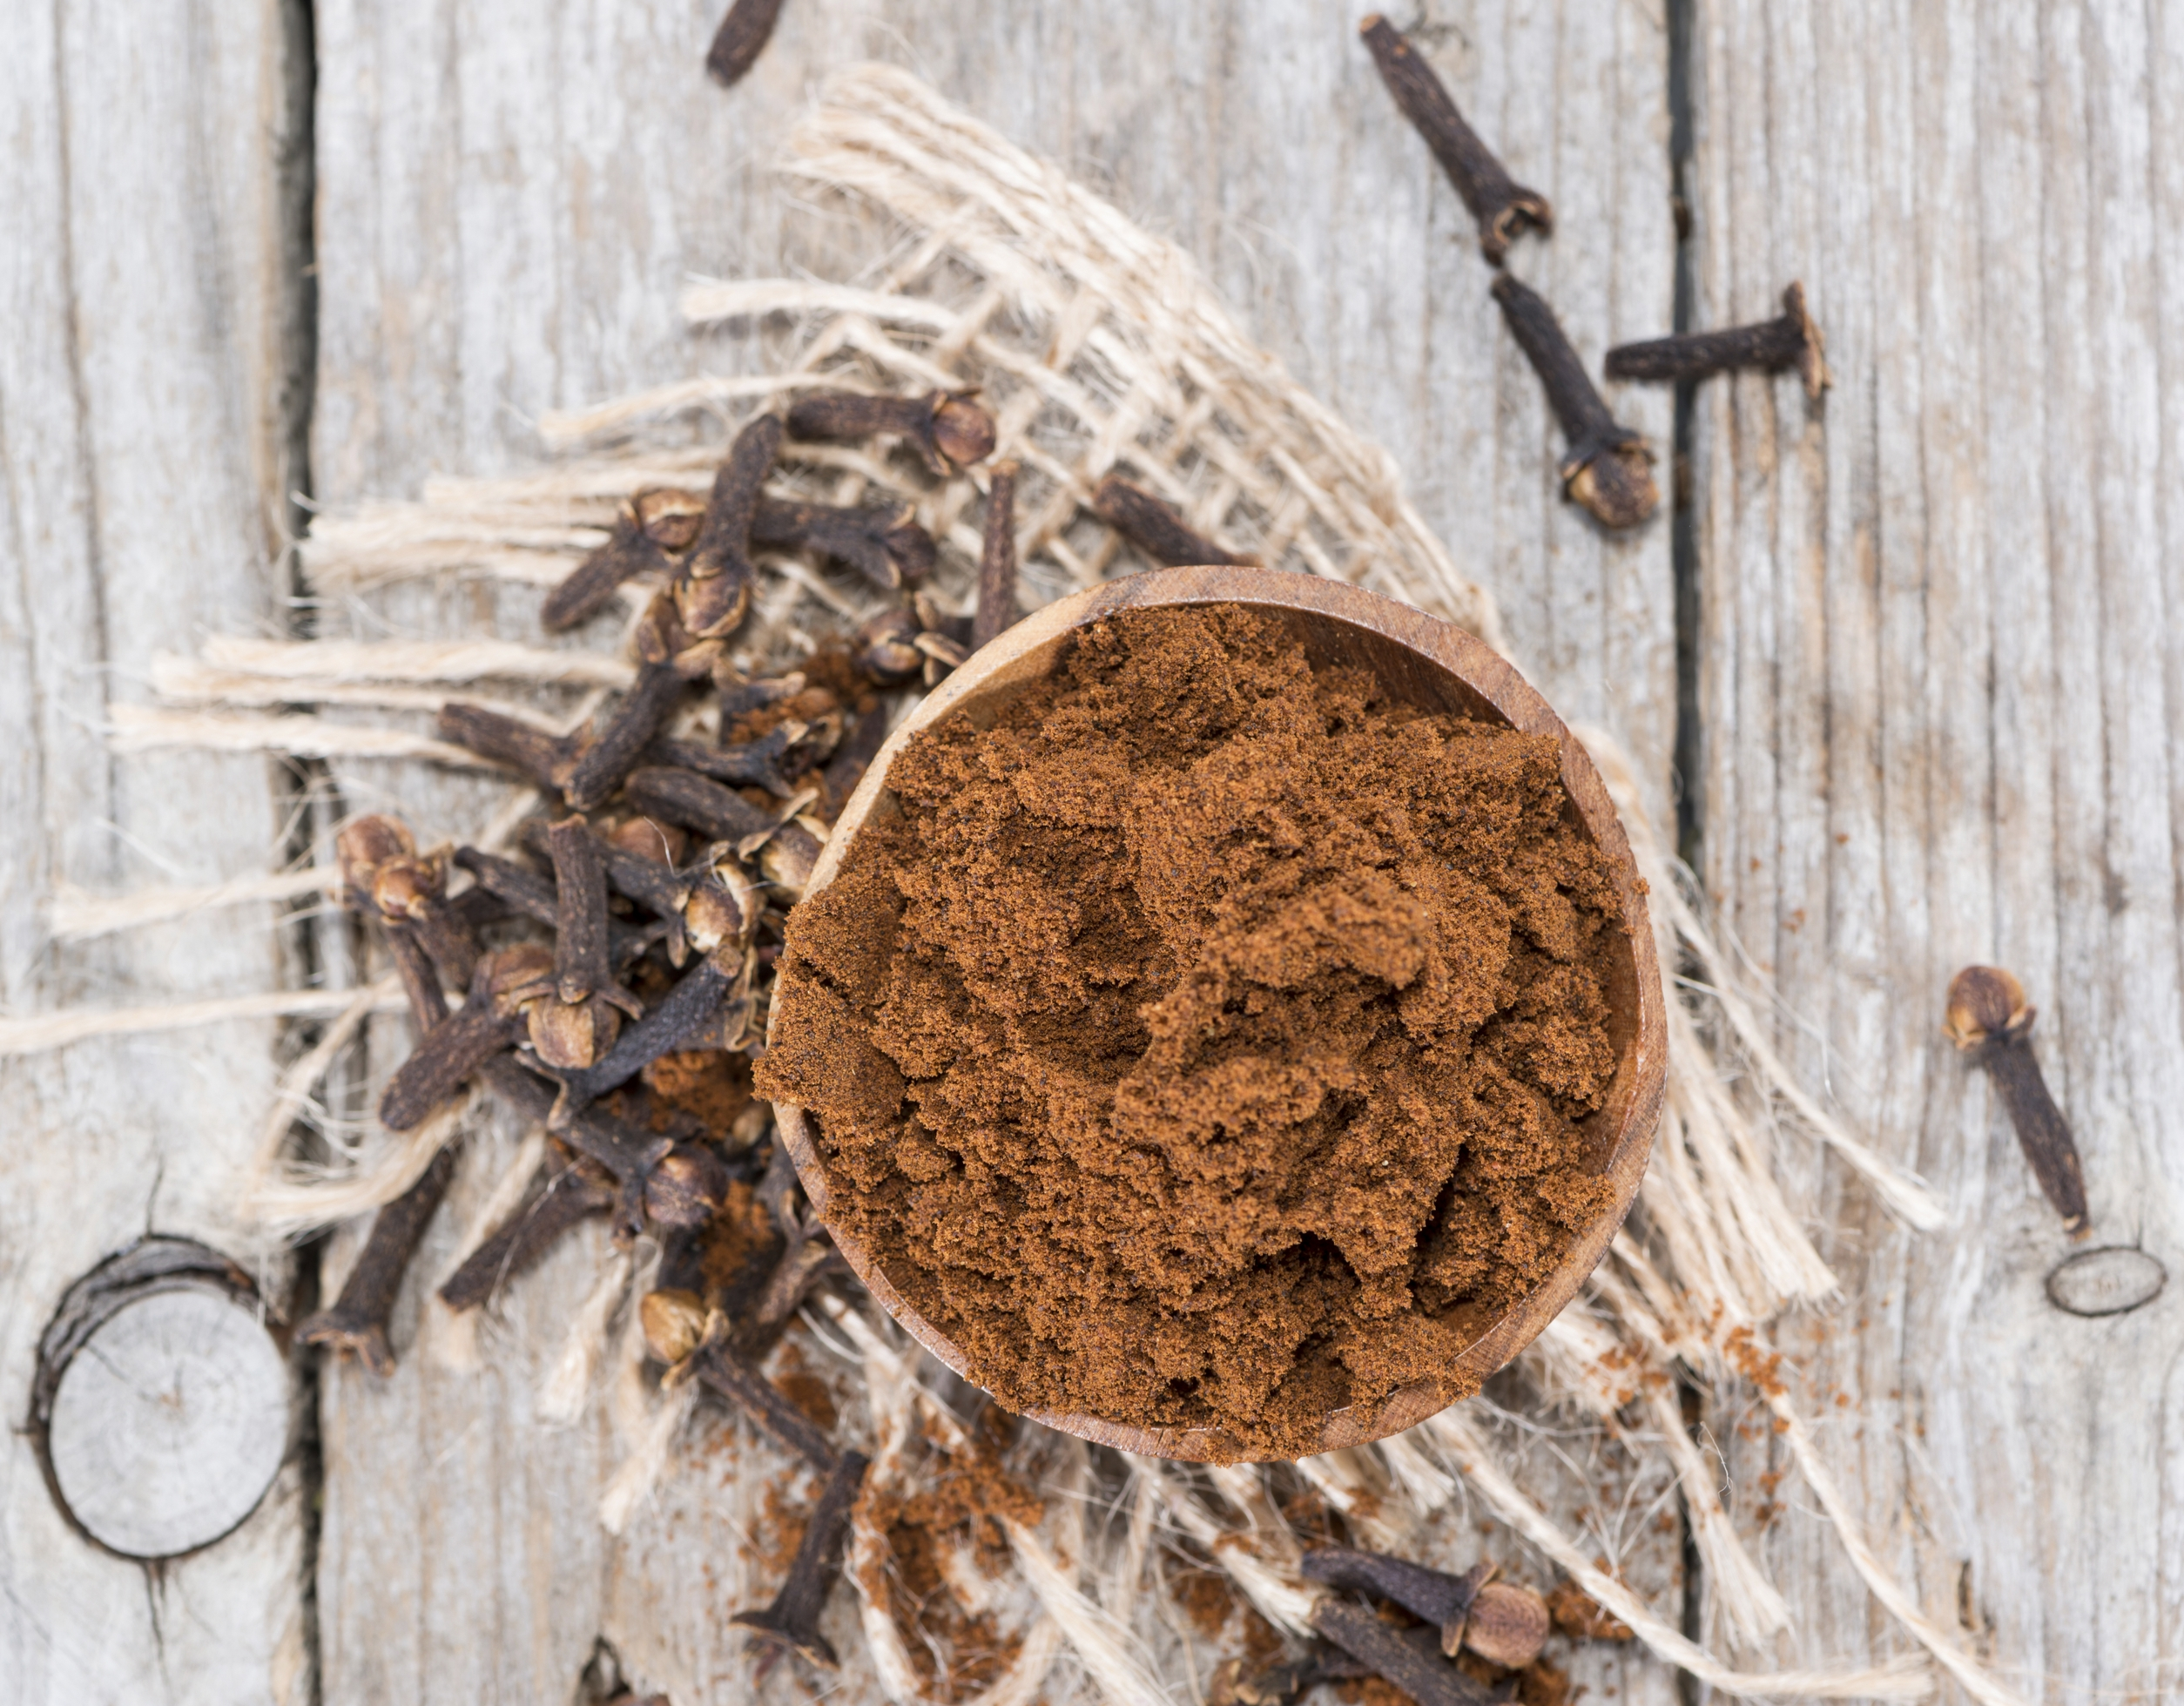 Portion of fresh made Clove Powder on vintage wooden background